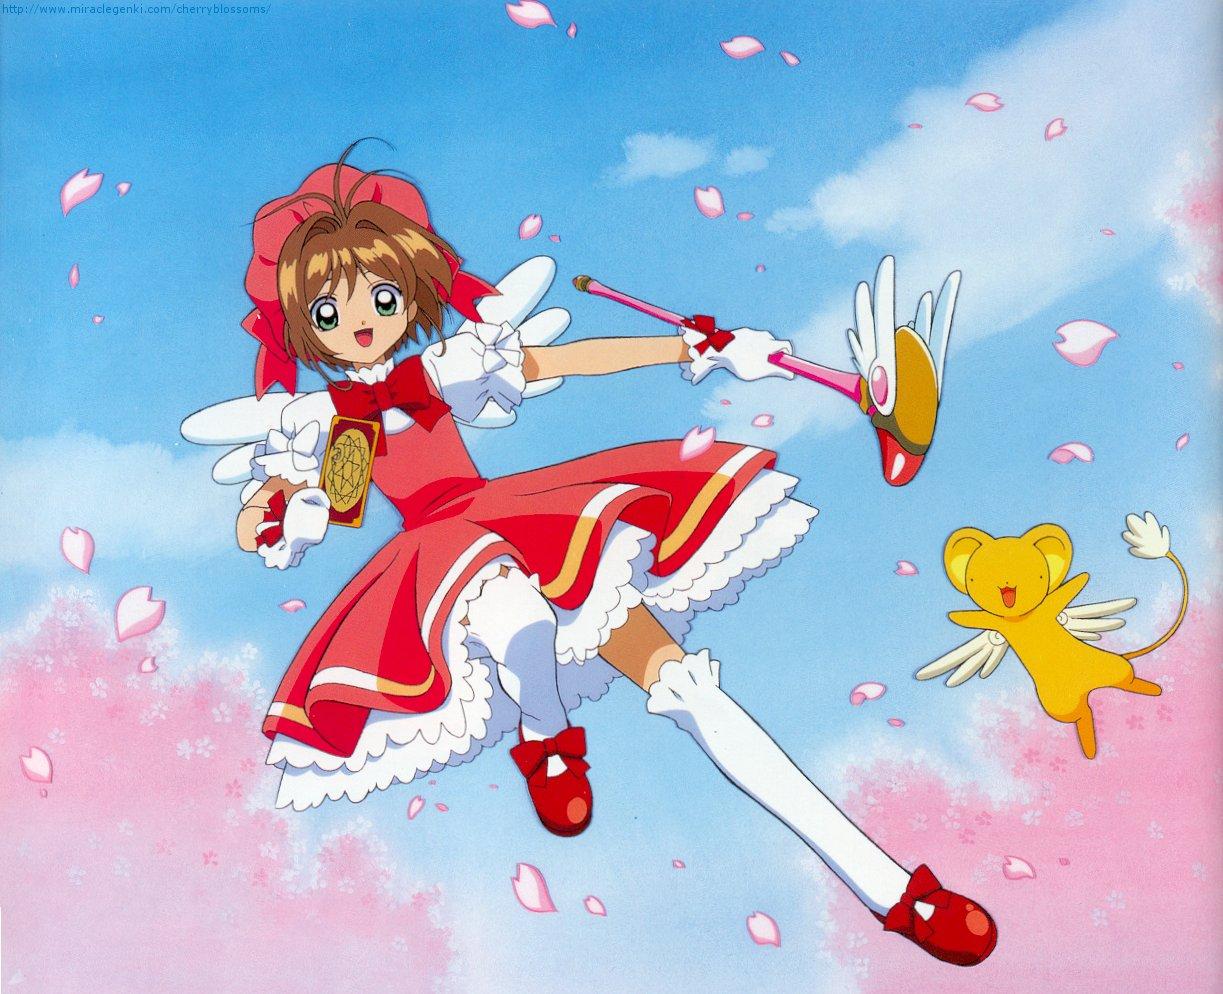 Cardcaptor Sakura, Cheerio!, Kinomoto Sakura, Kerochan, Flying, Pink